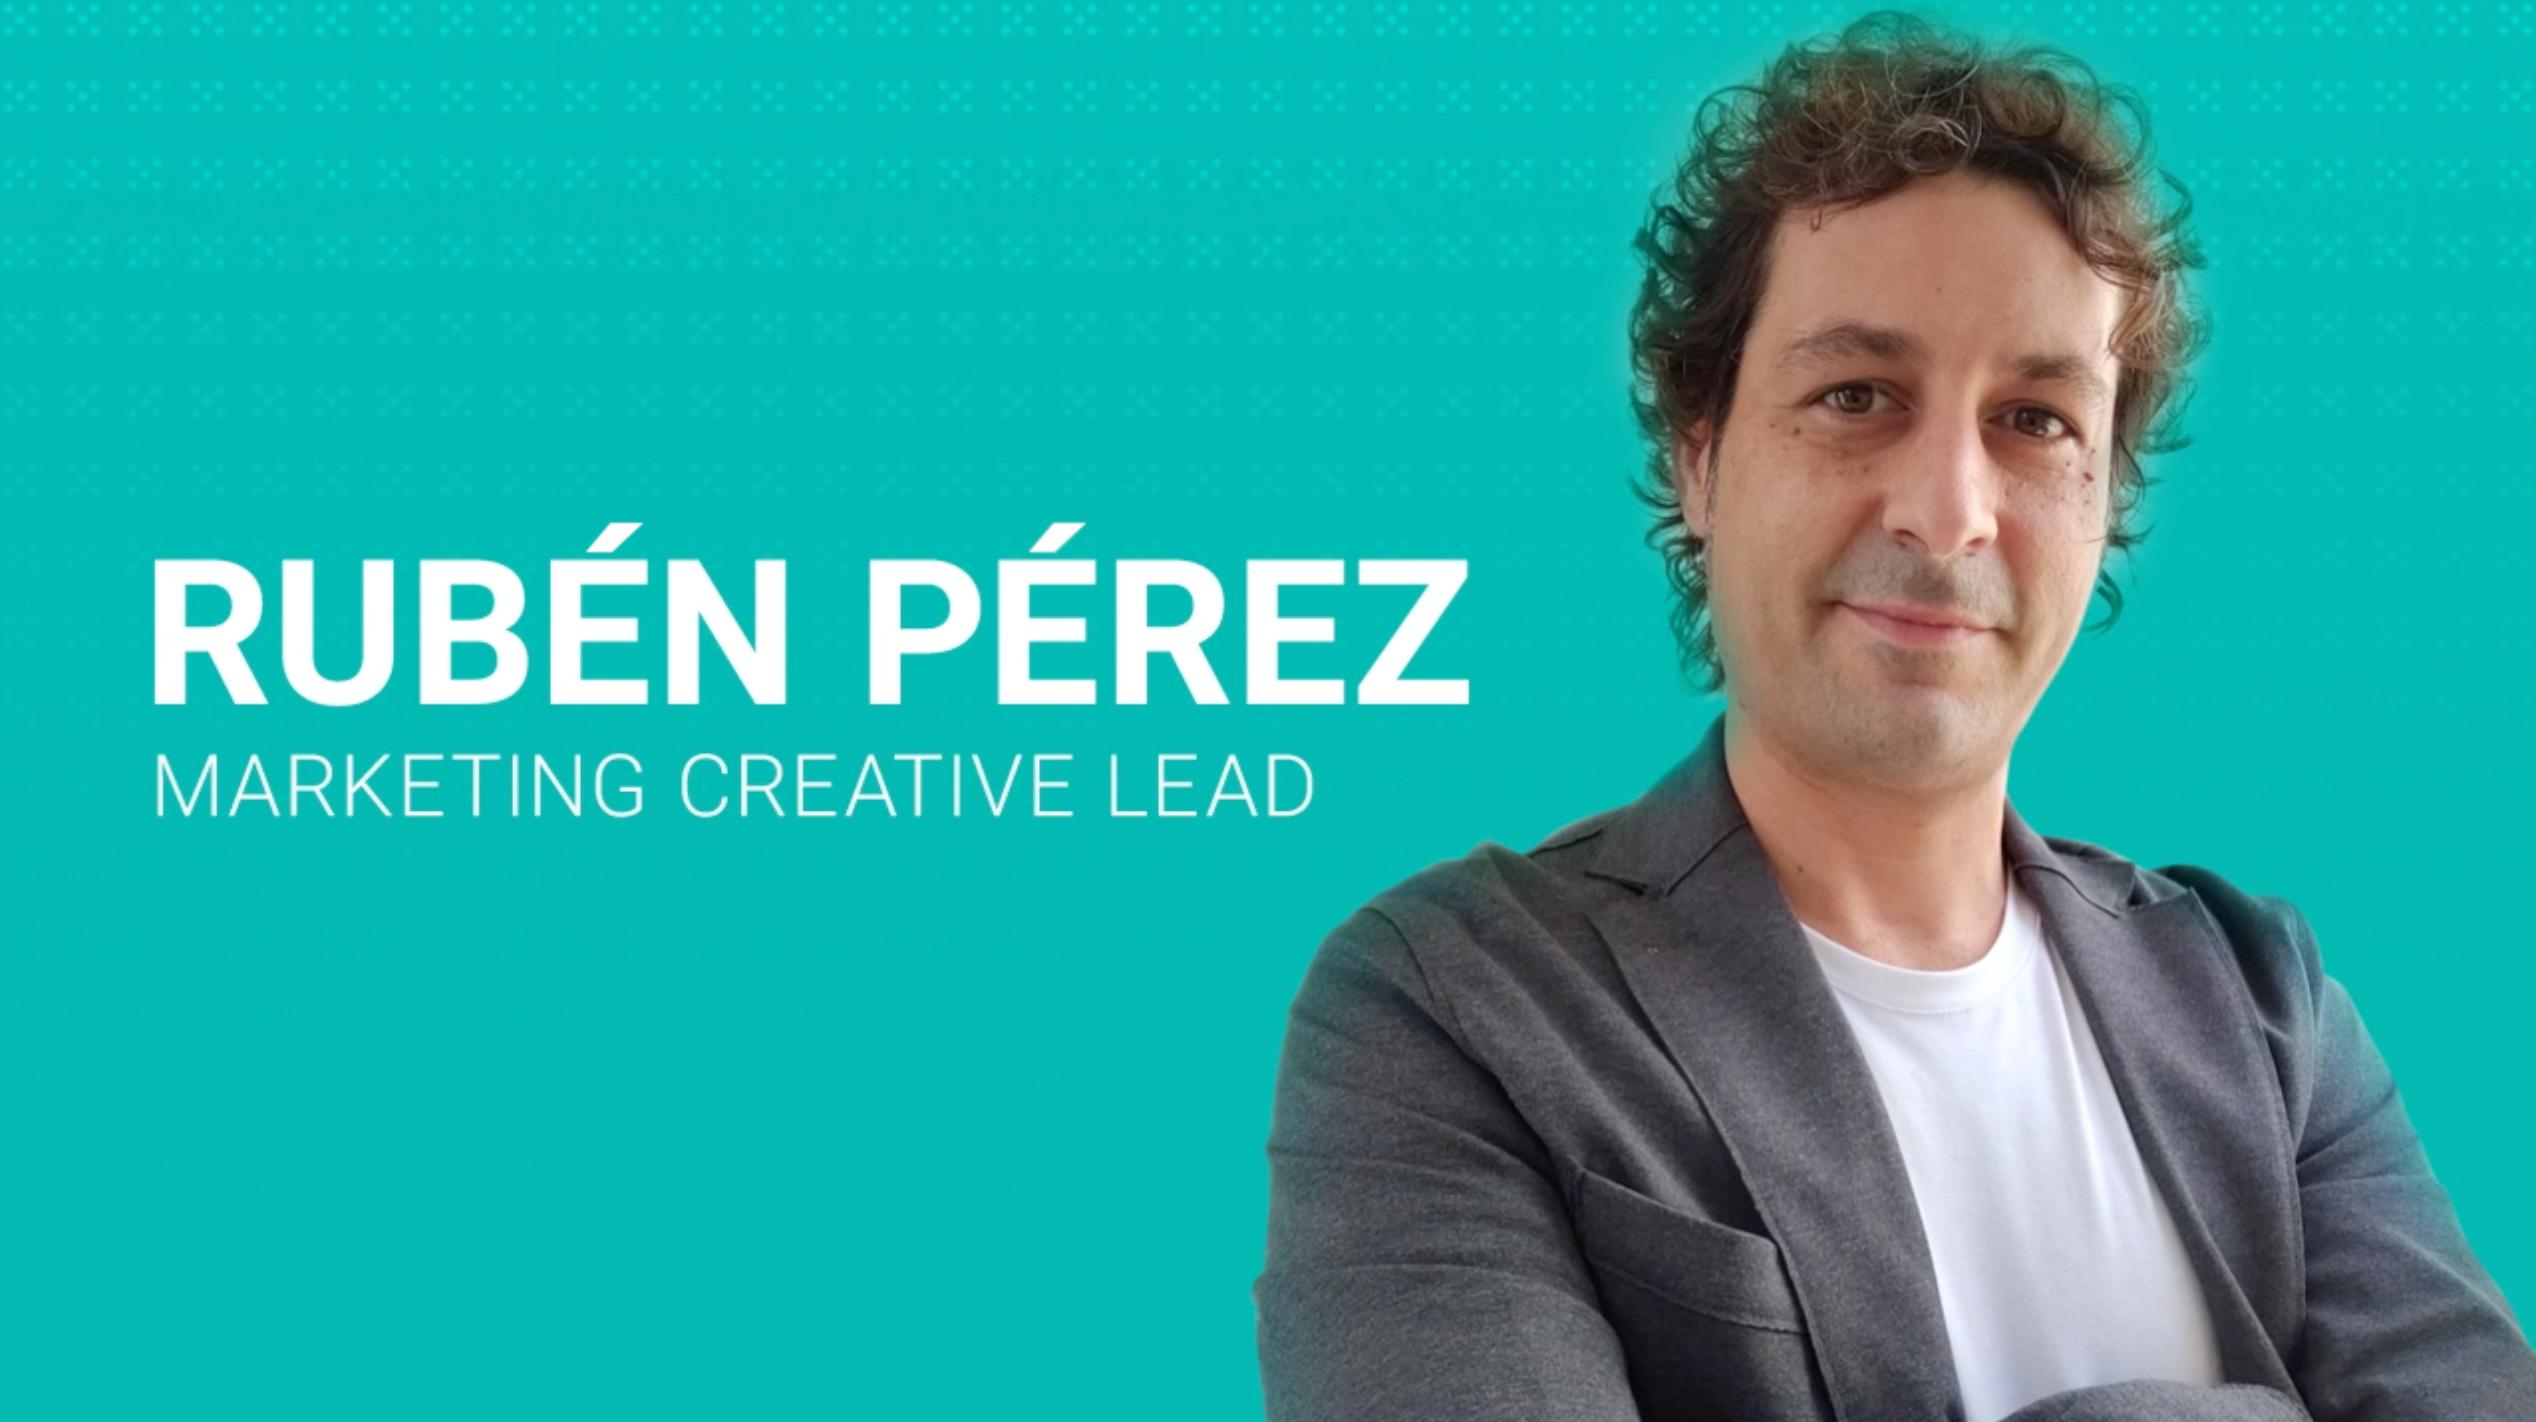 Relax Welcomes Marketing Creative Lead Rubén Pérez